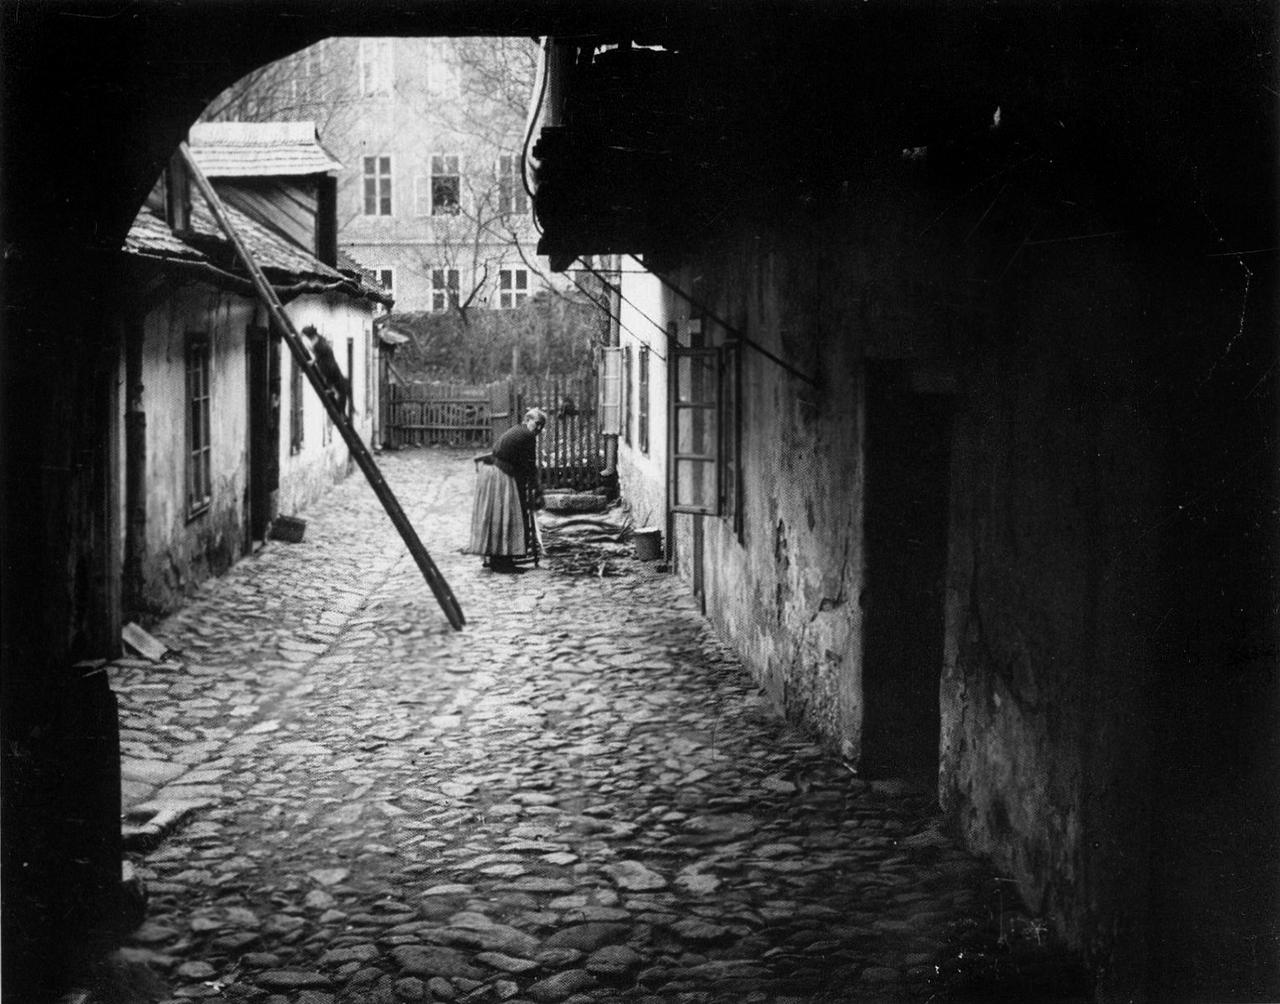 History in Photos: André Kertész